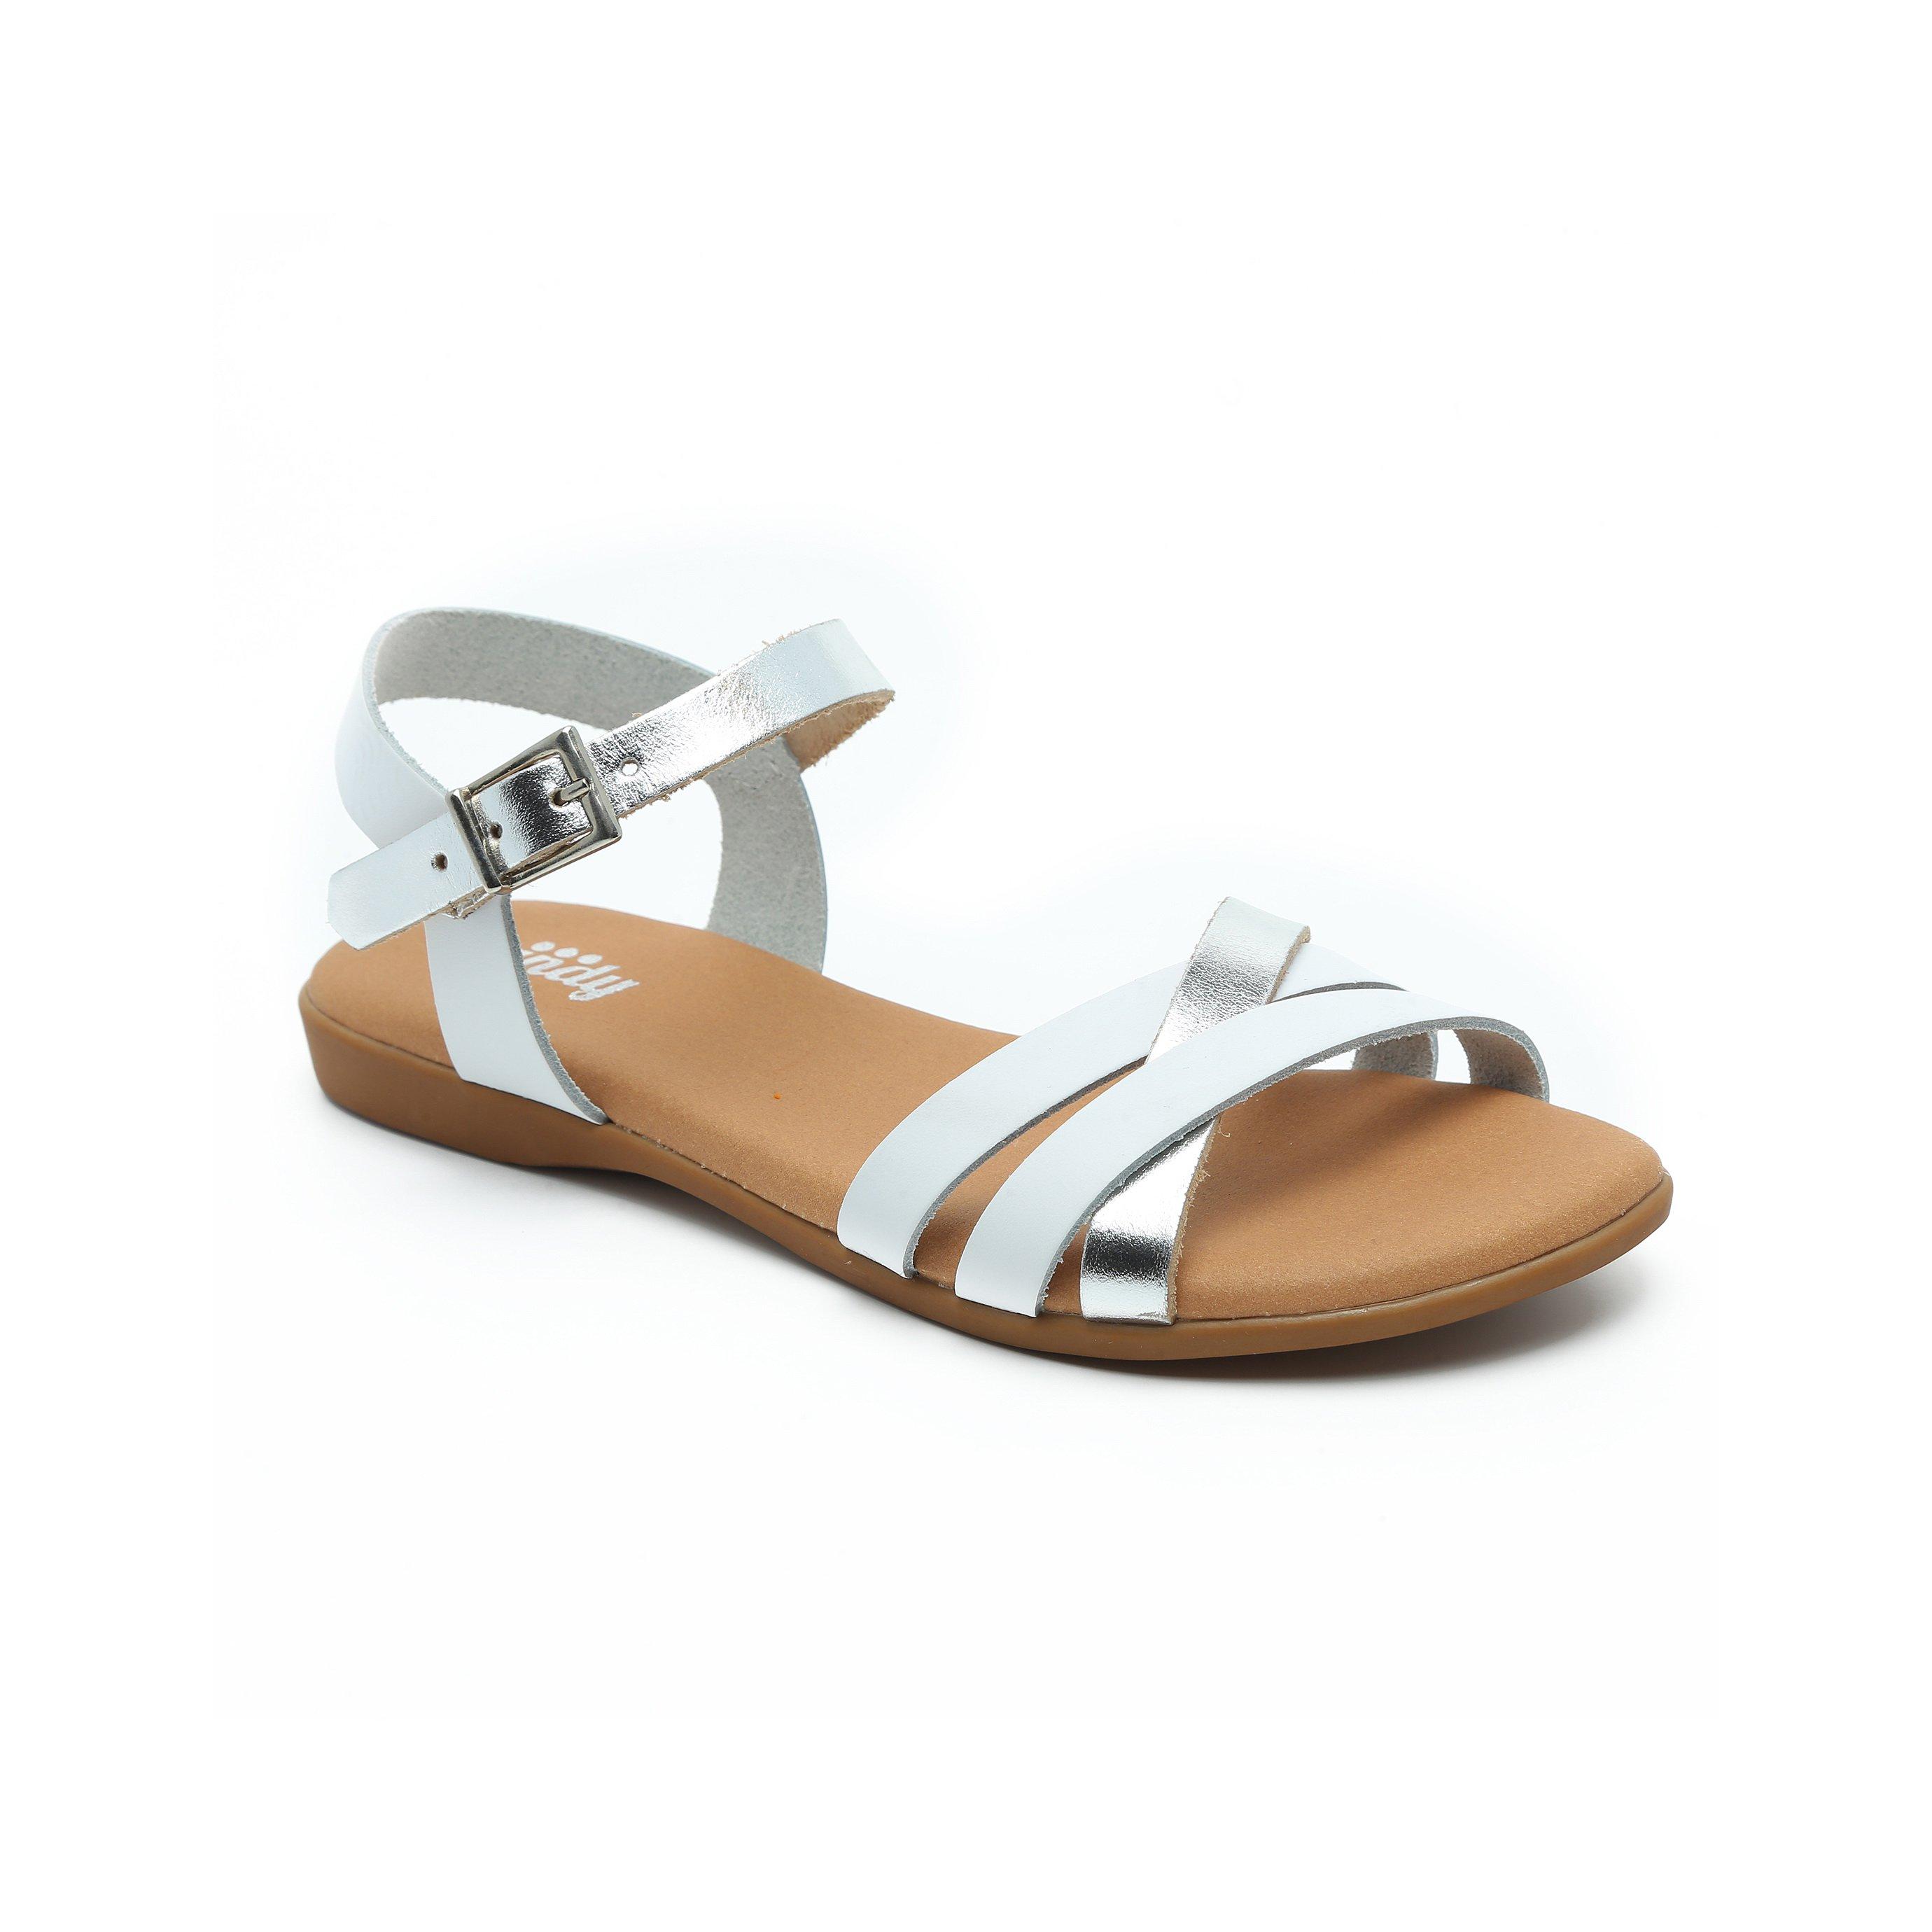 Candy - סנדלי רצועות מוצלבות בצבע לבן בשילוב מט מבריק